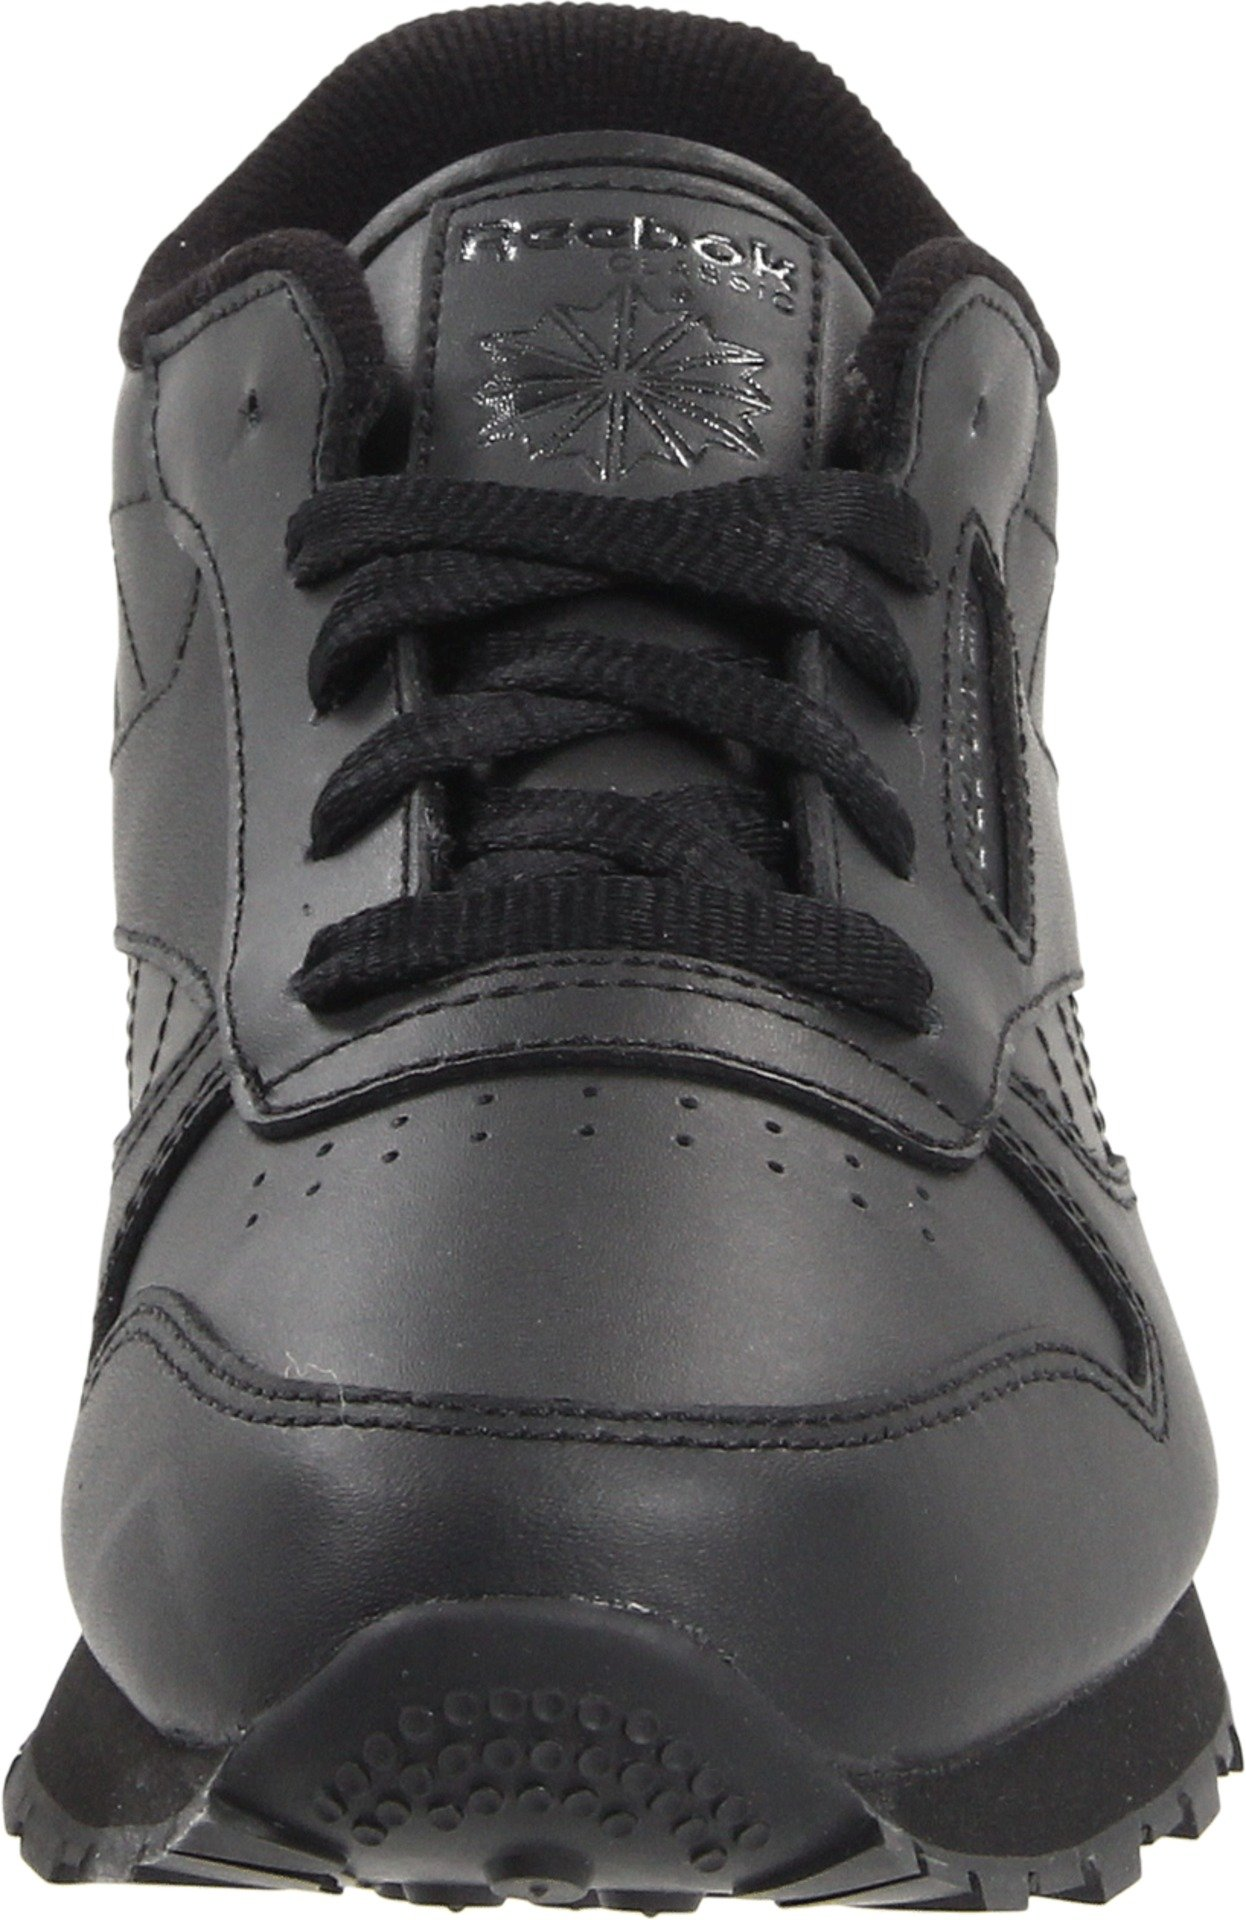 Reebok Classic Leather Shoe,Black/Black/Black,11.5 M US Little Kid by Reebok (Image #4)